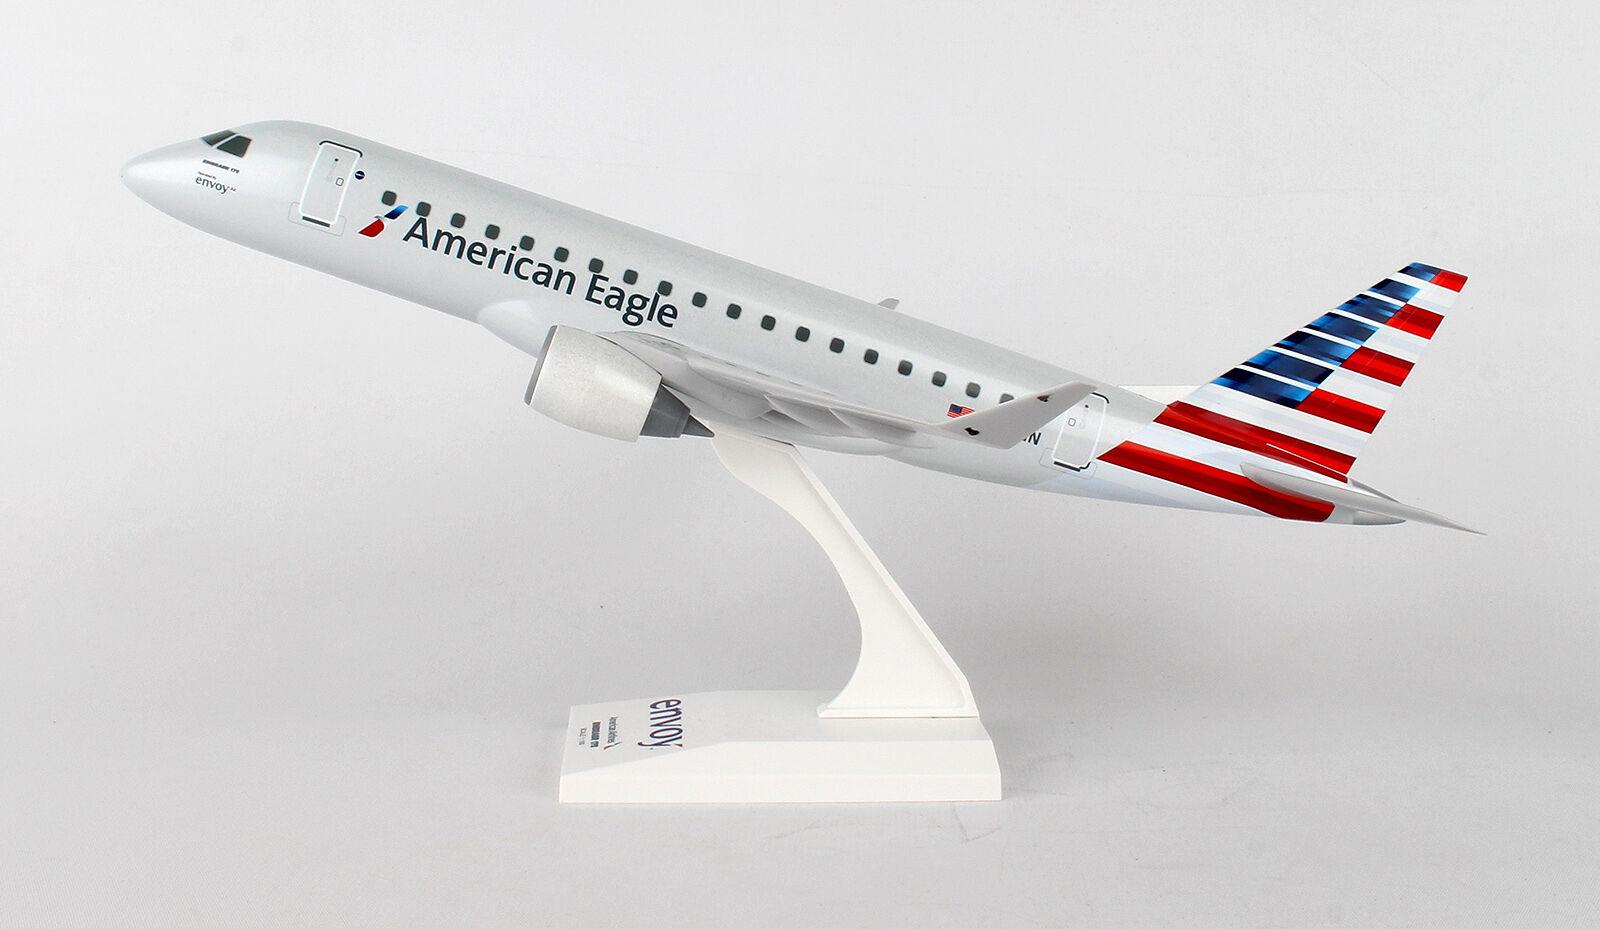 Skymarks Model SKR902 Embraer ERJ-175 American Eagle  N220NN in 1:100